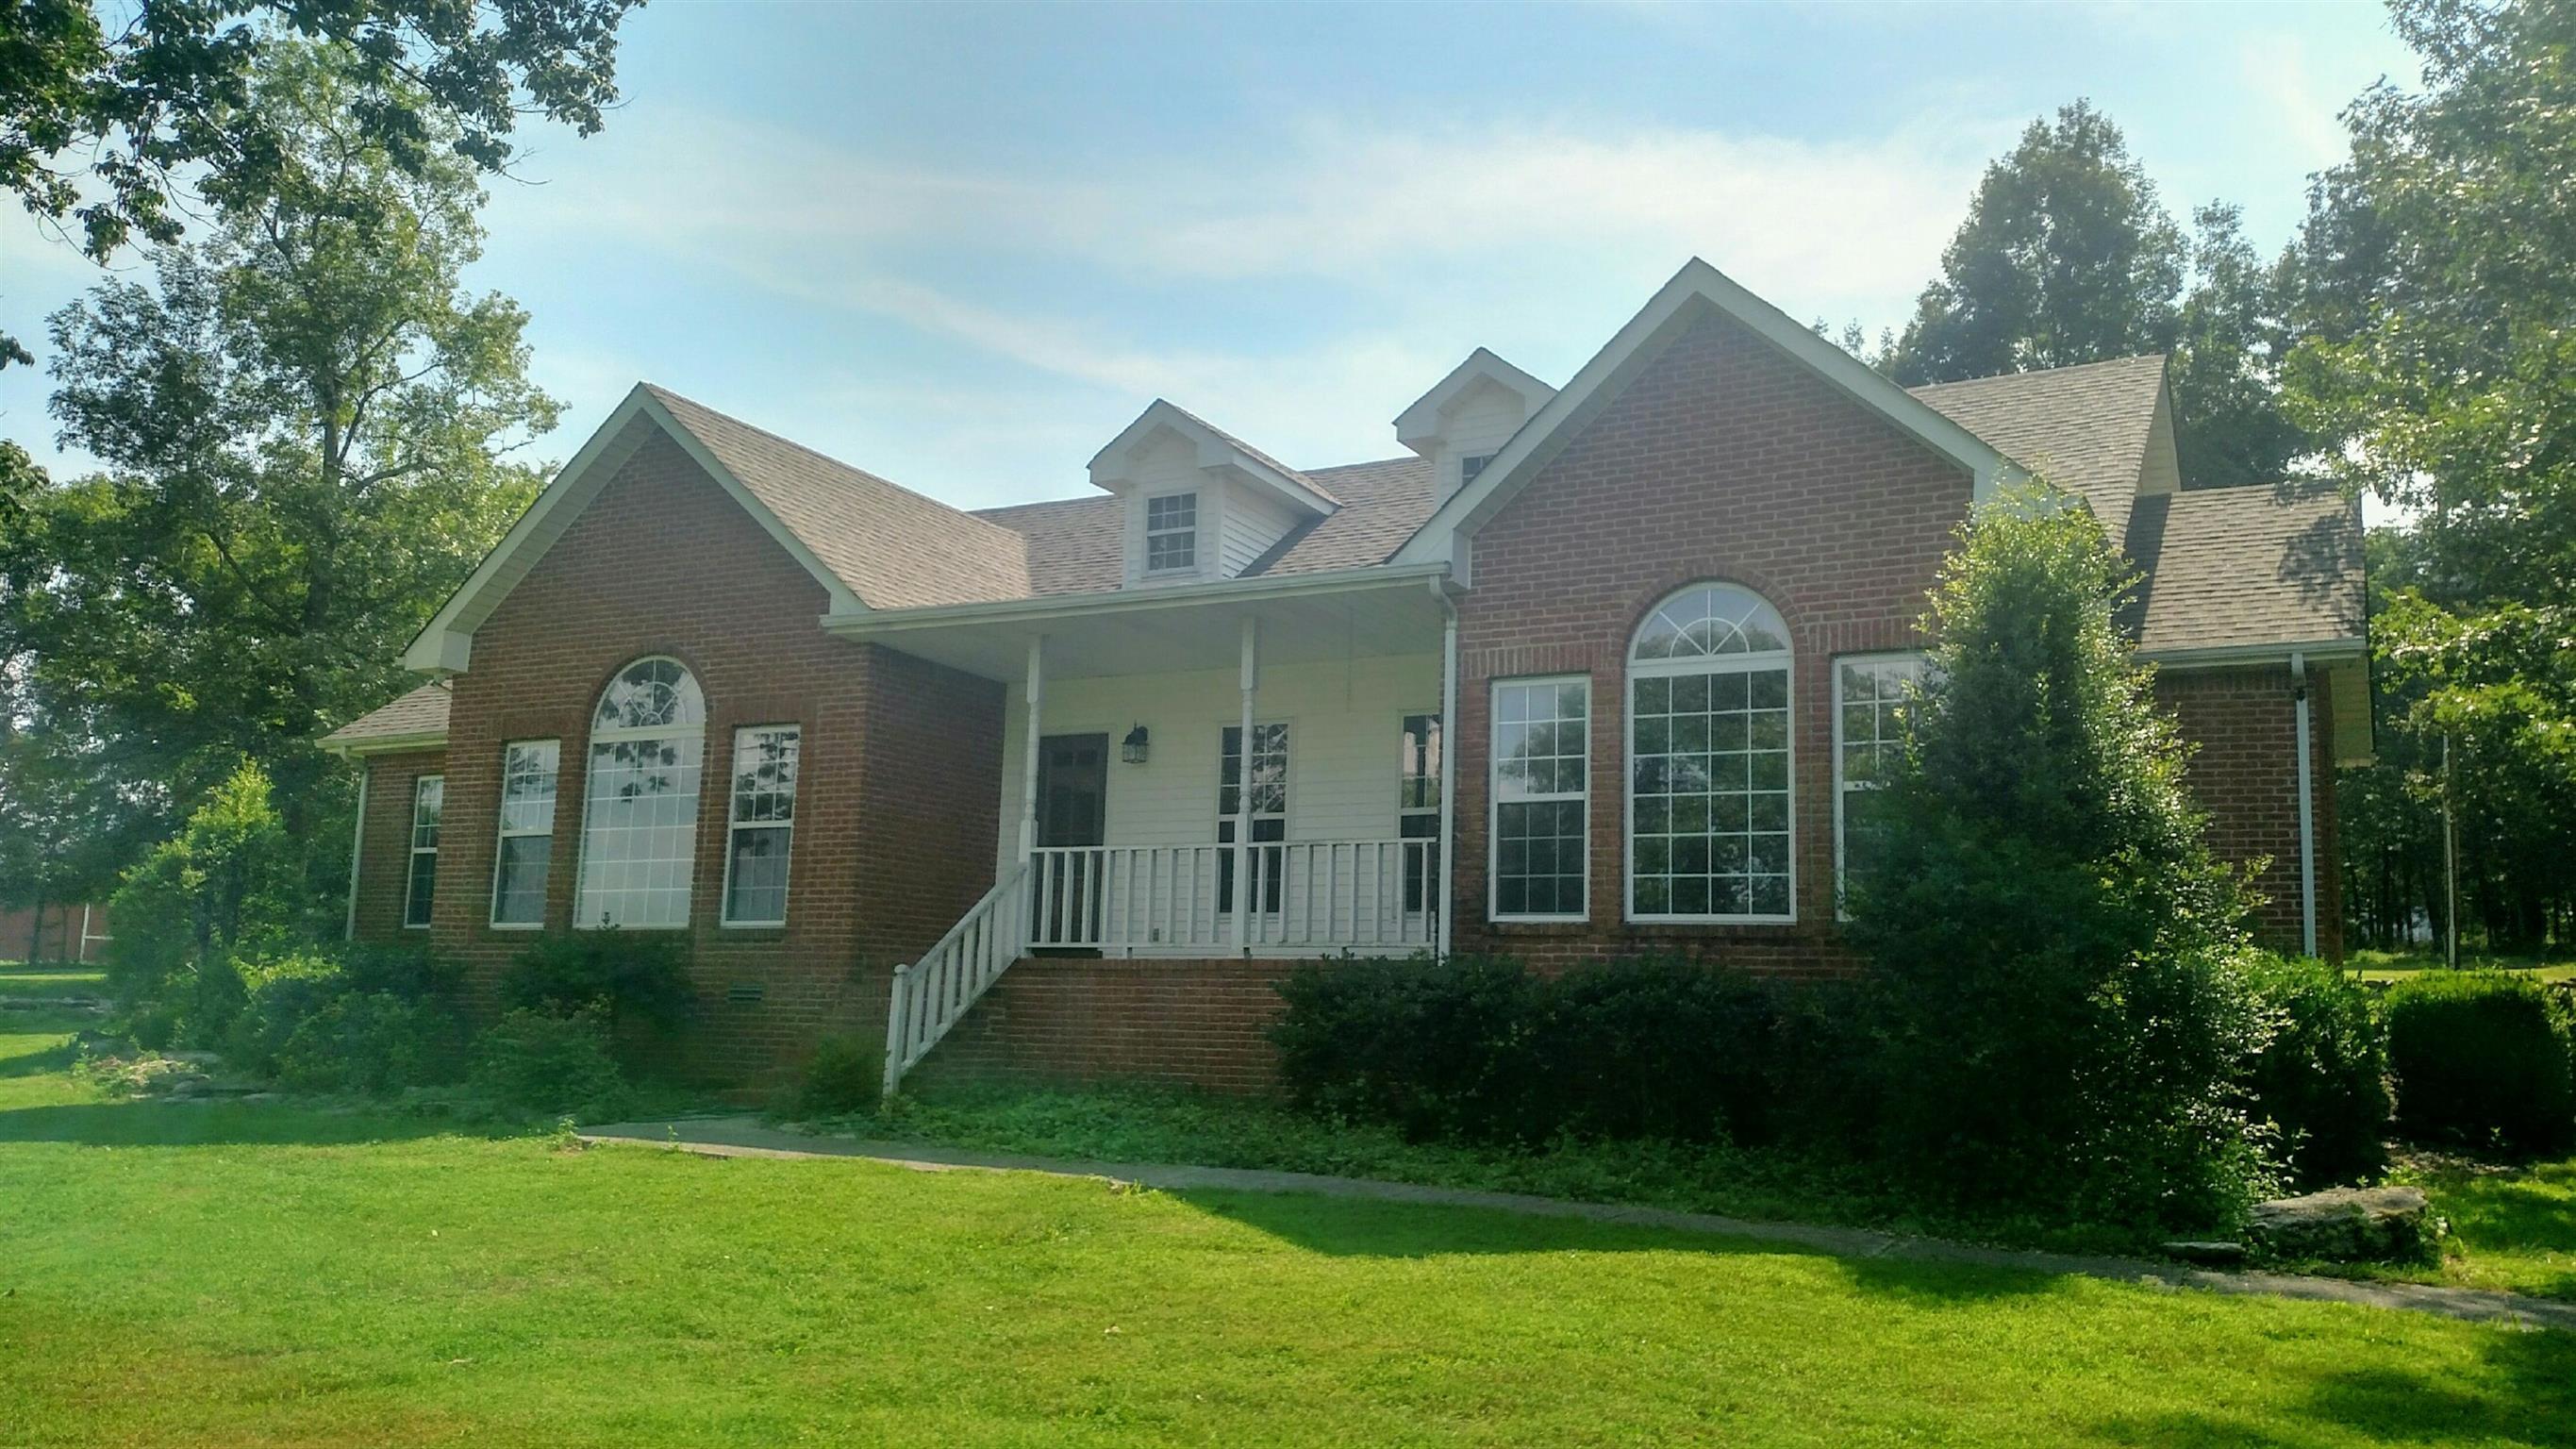 4835 Highway 231 S, Castalian Springs, TN 37031 - Castalian Springs, TN real estate listing